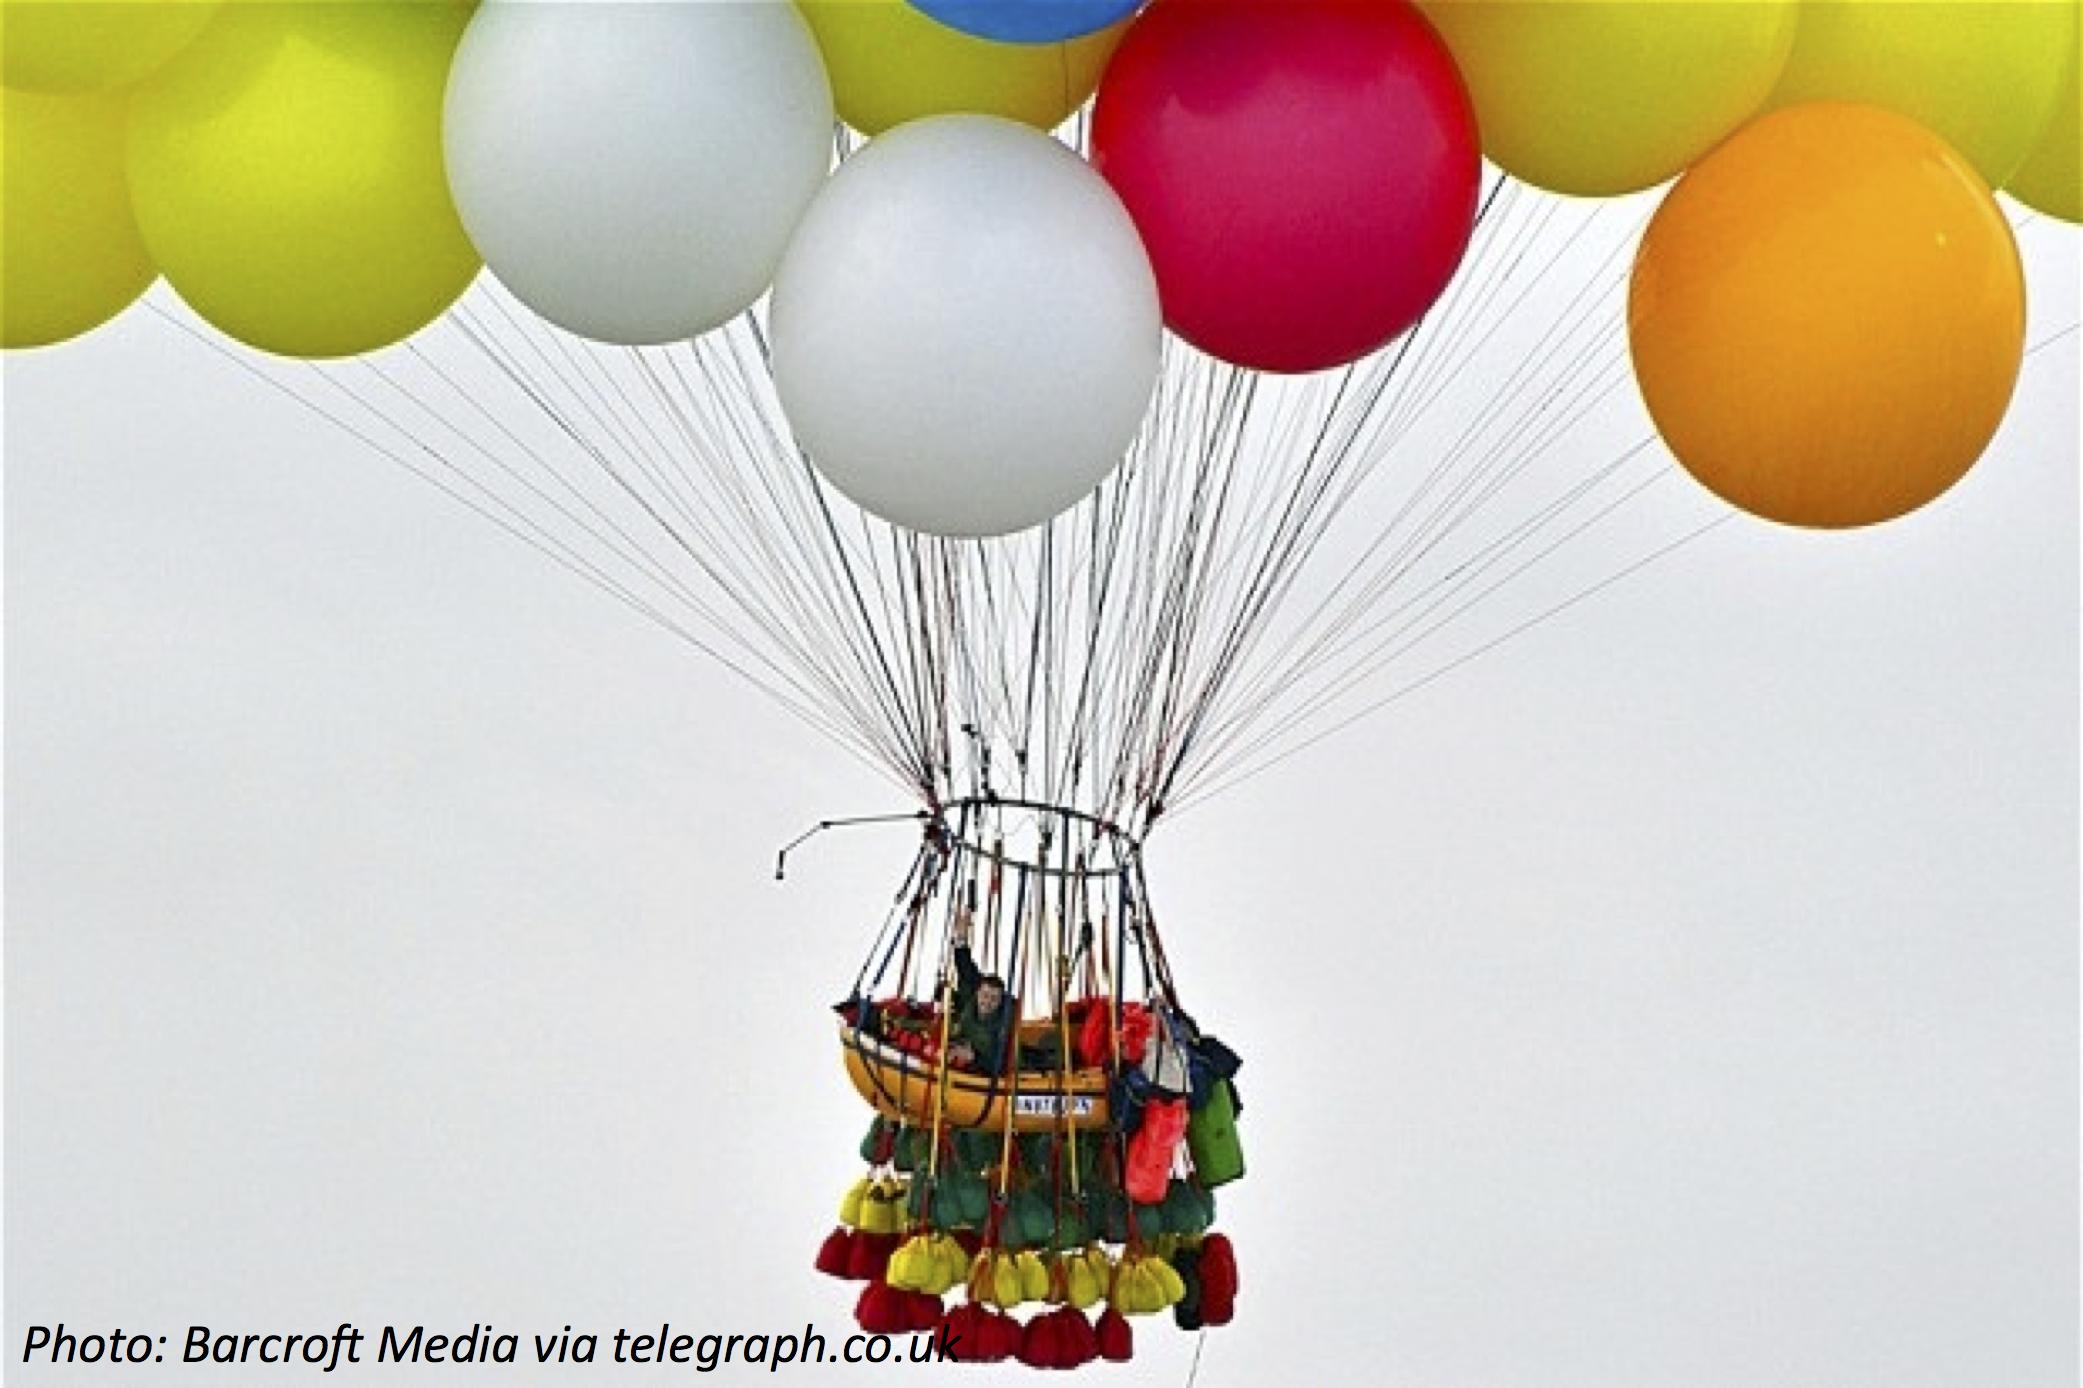 Wrong Kind of Balloon Ride